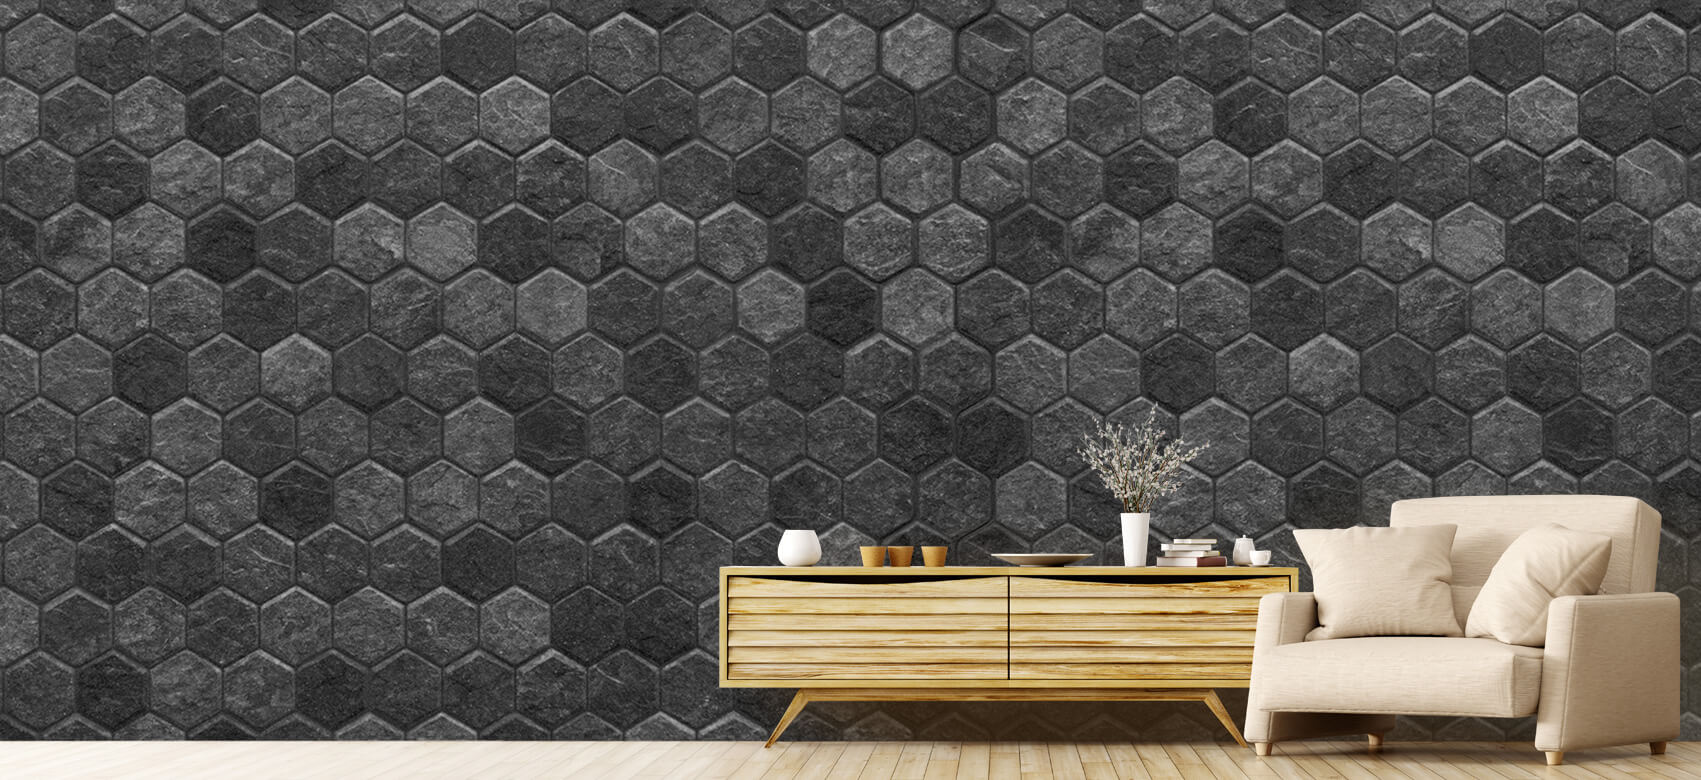 Beton, hout en steen Kleine zwarte steentjes 7